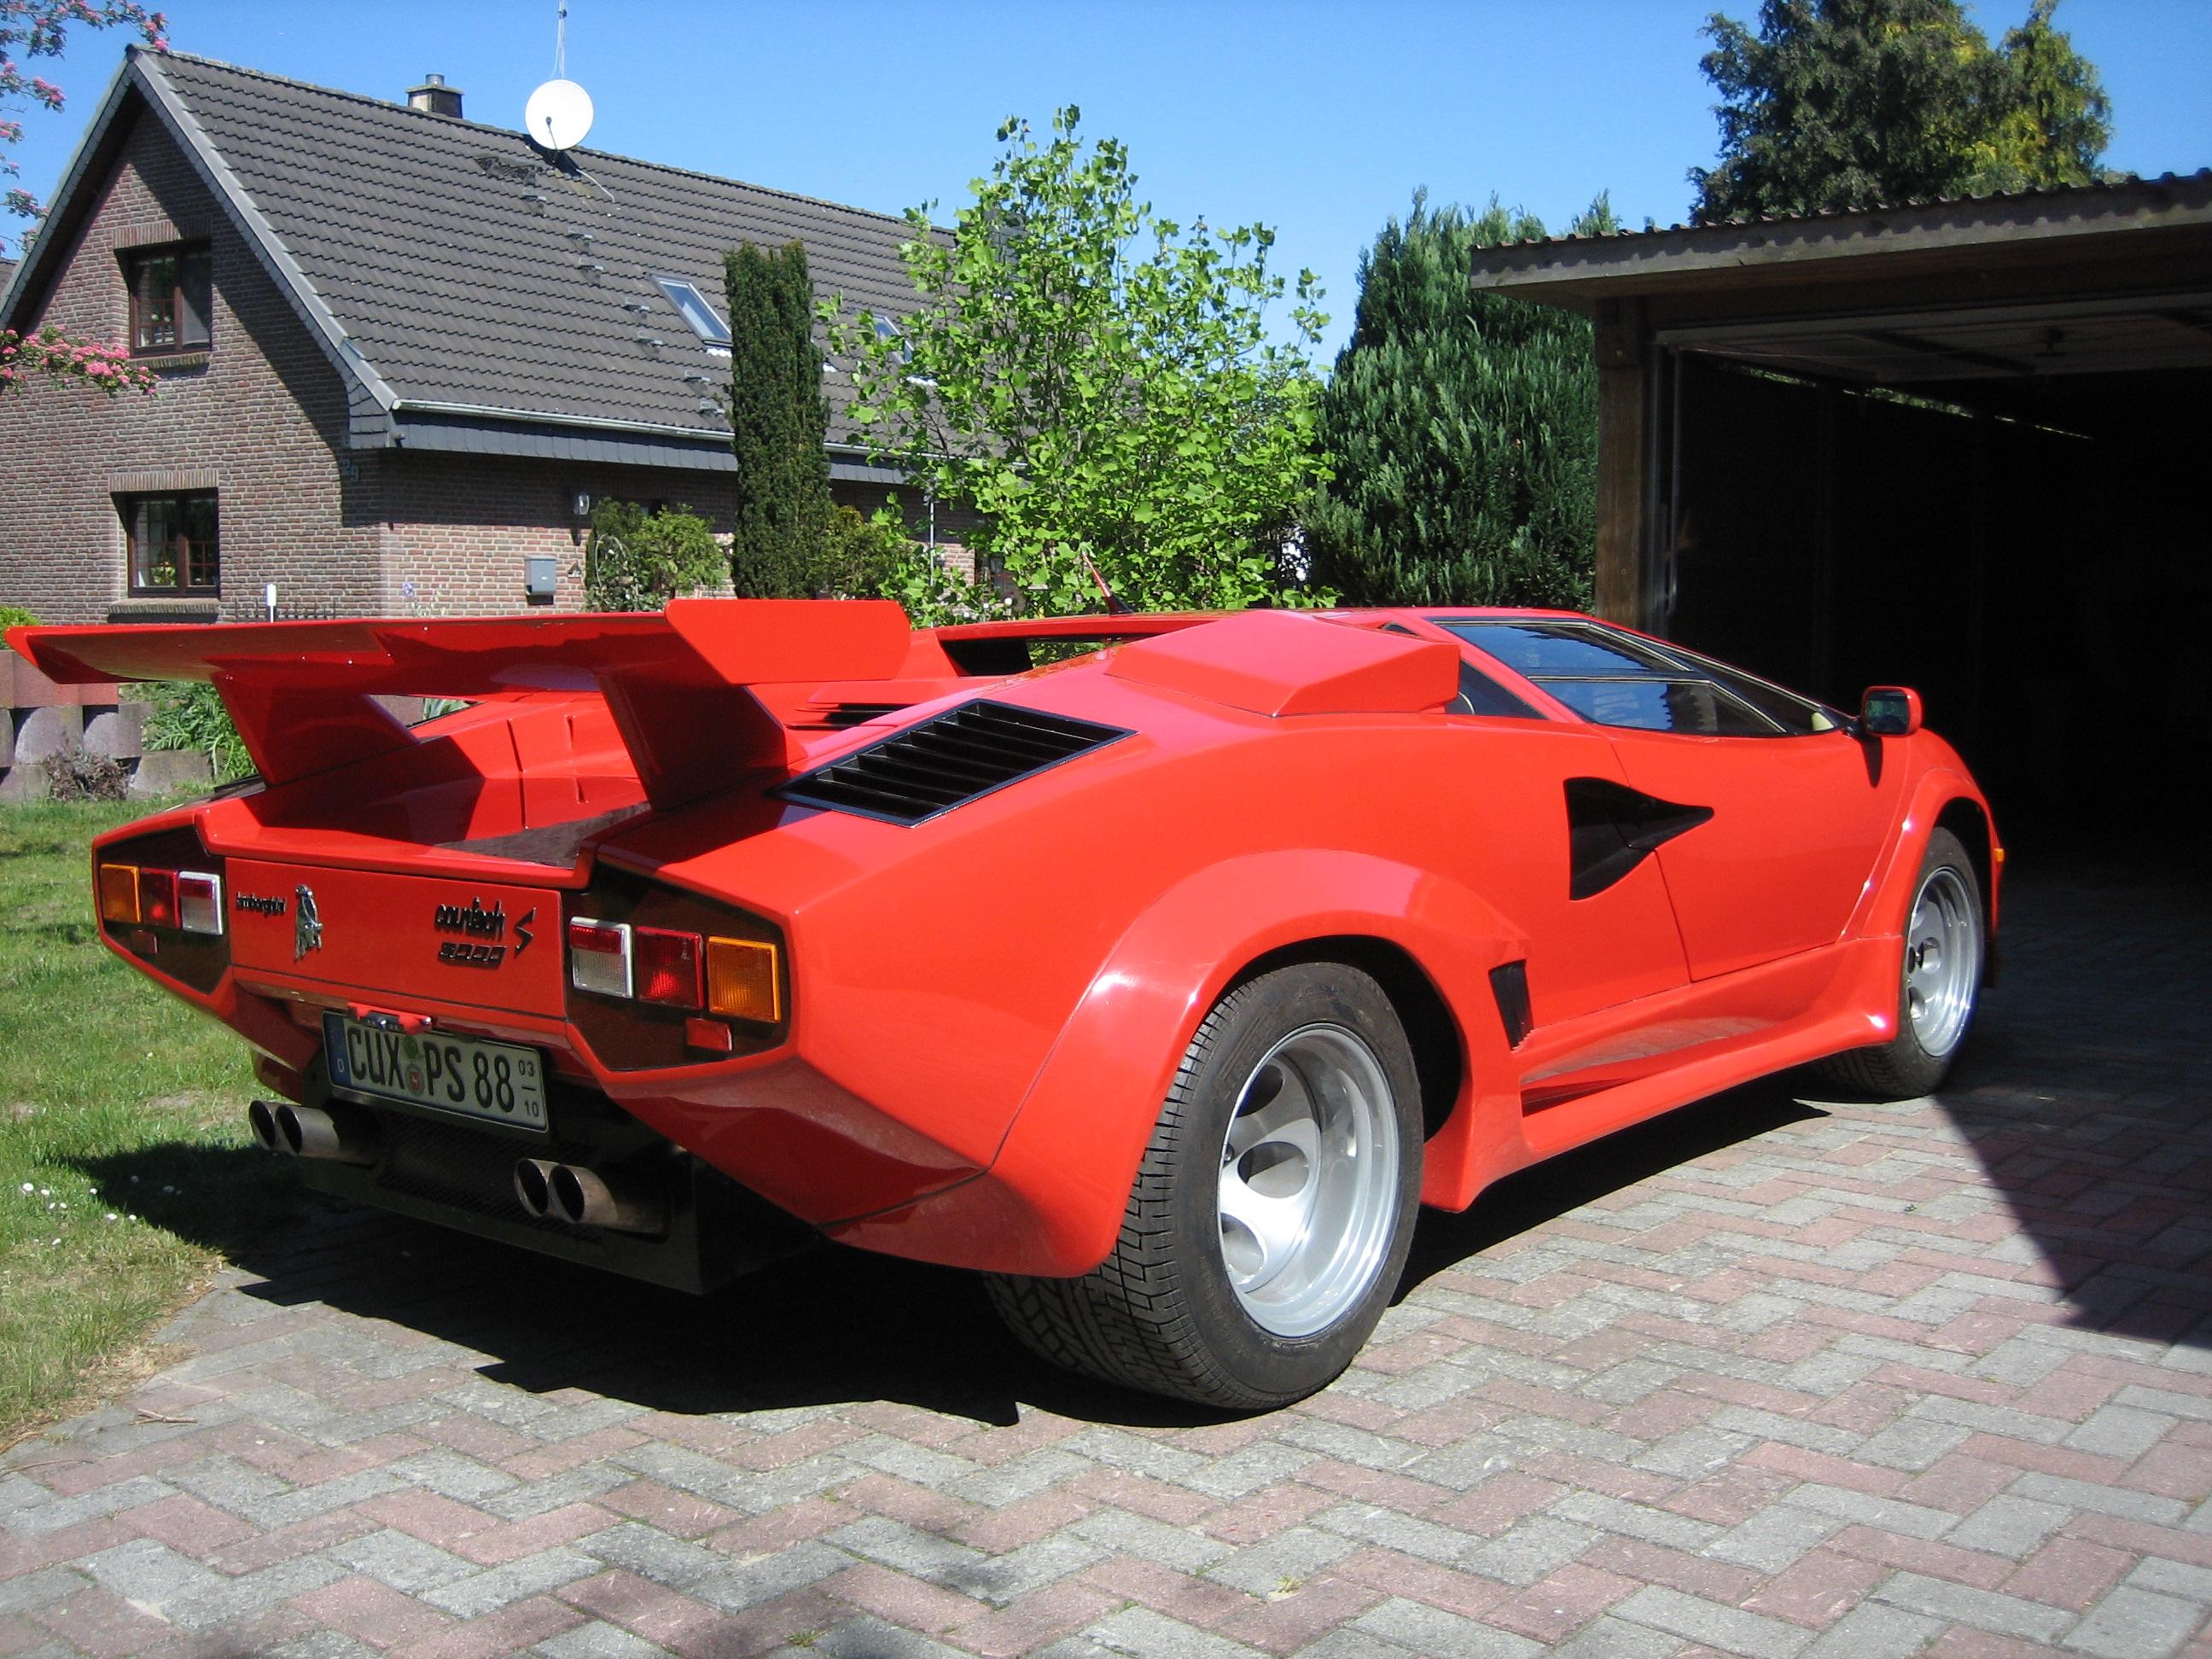 IMG_6522 Wonderful Lamborghini Countach Strohm De Rella Cars Trend